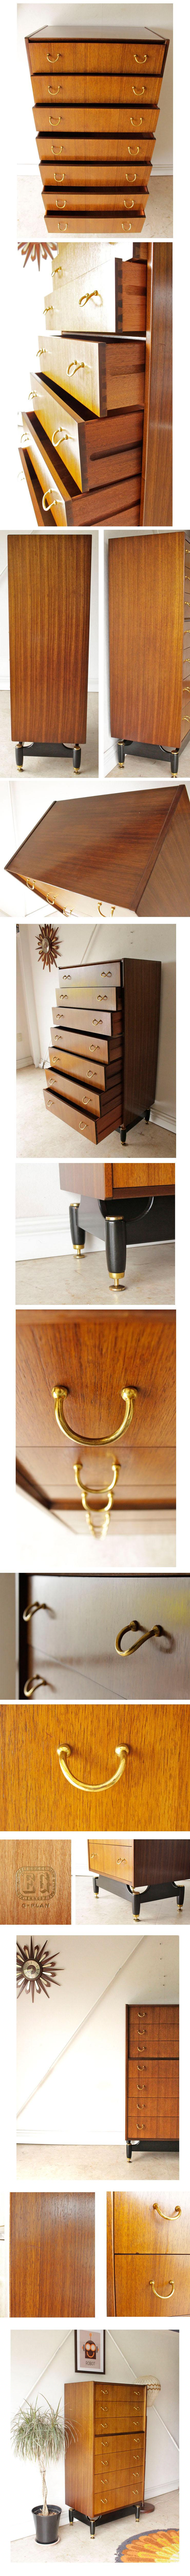 G-planジープラン7段チェスト・収納・ブラック&トーラ/イギリス製ビンテージ家具ミッドセンチュリー 014010